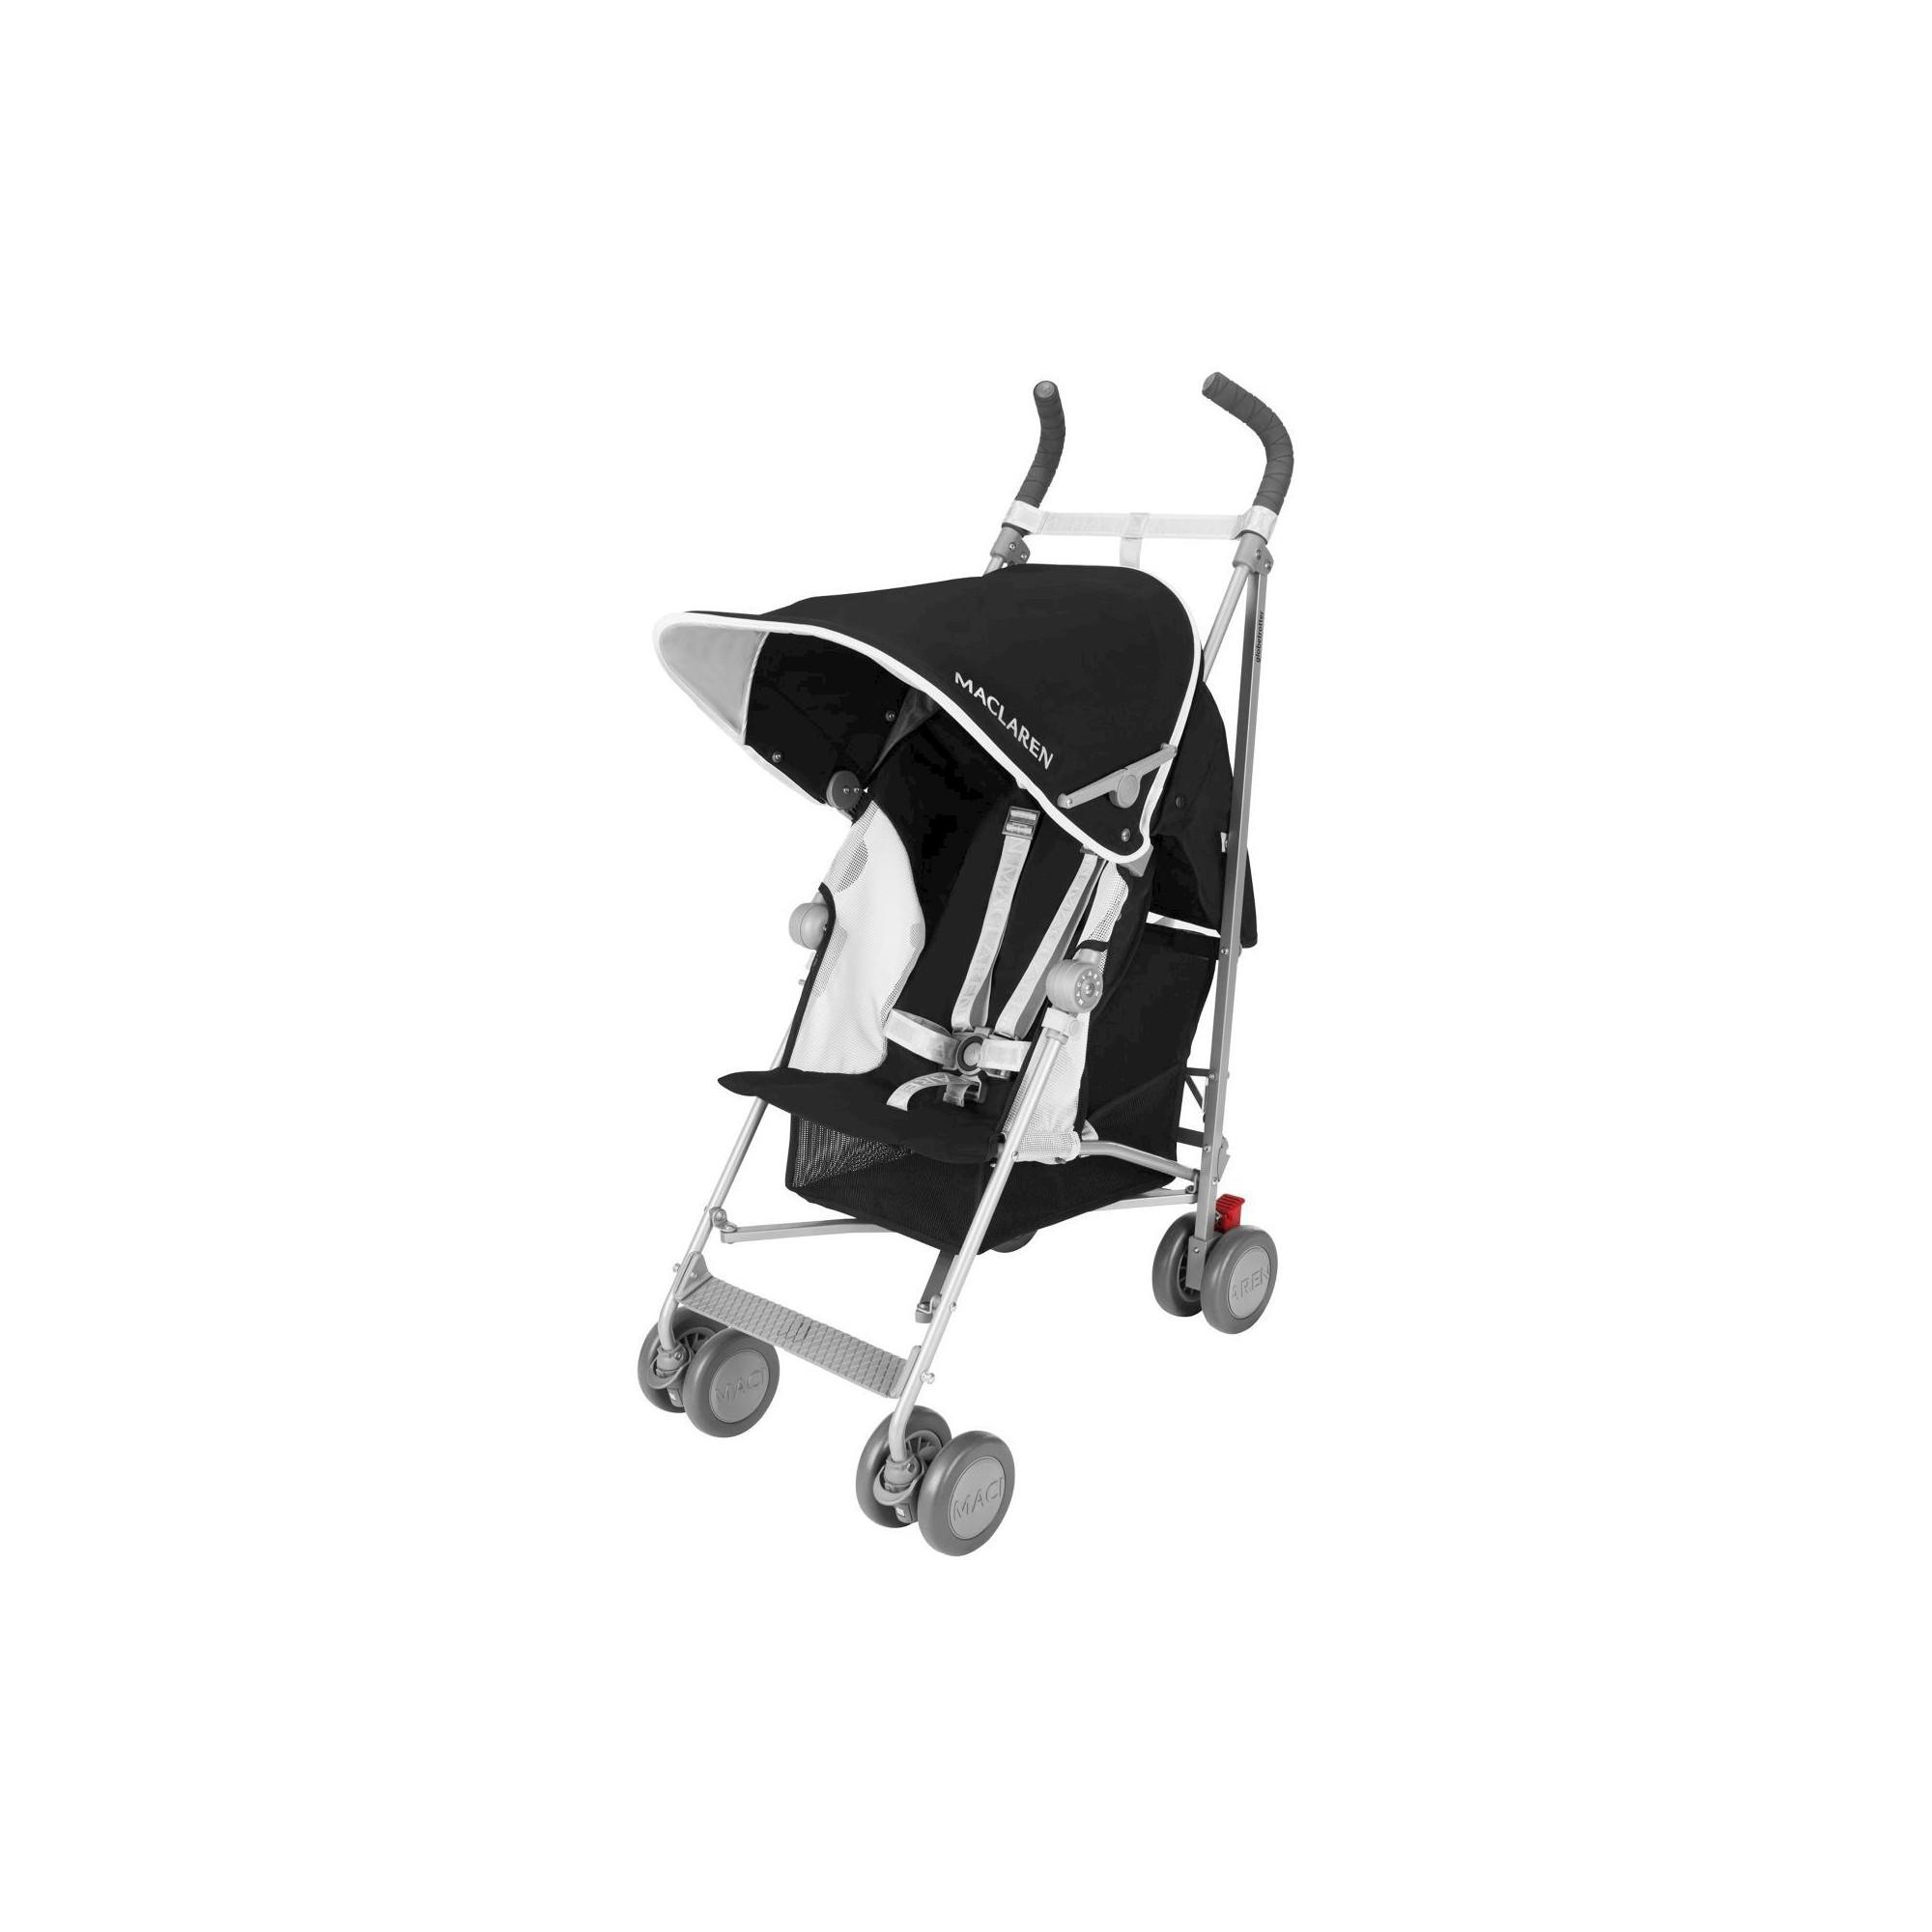 Maclaren Globetrotter Baby Umbrella Stroller Black White